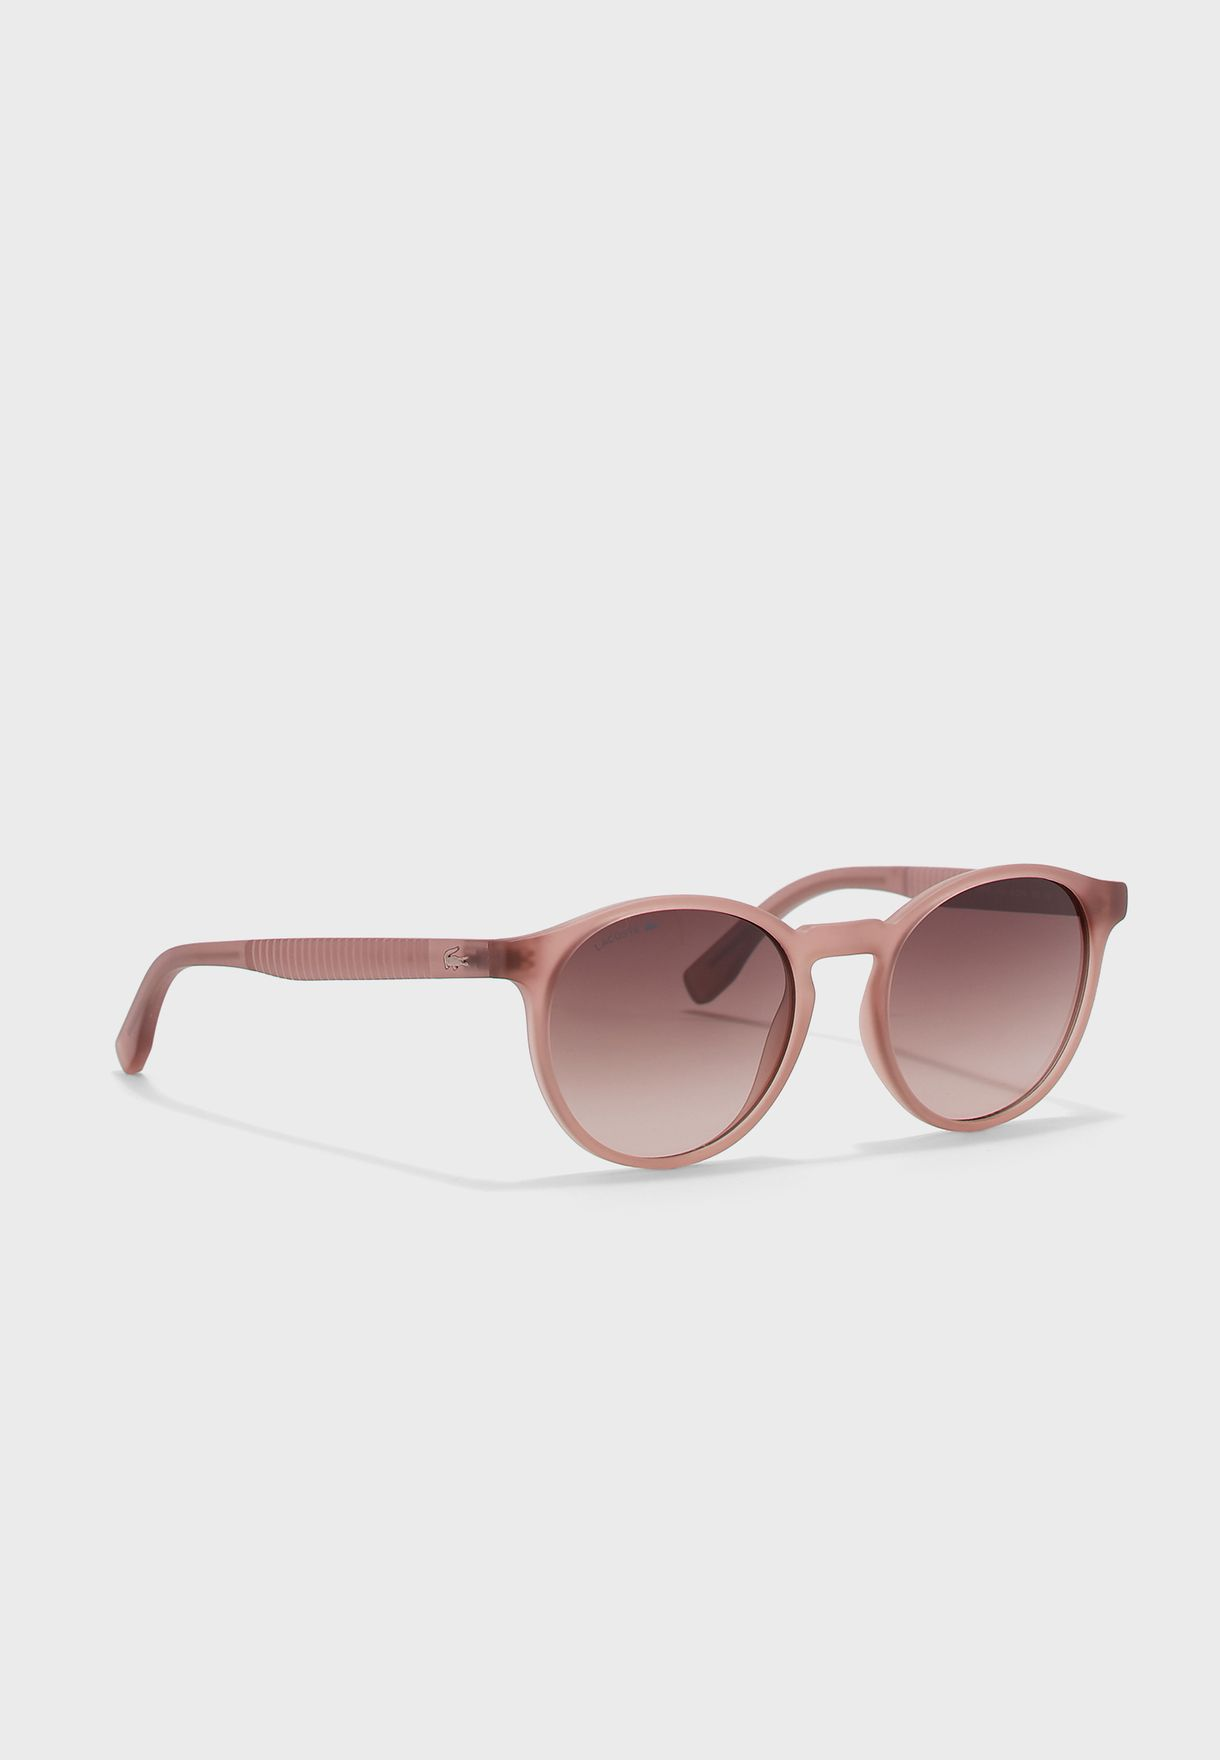 L888S Round Sunglasses